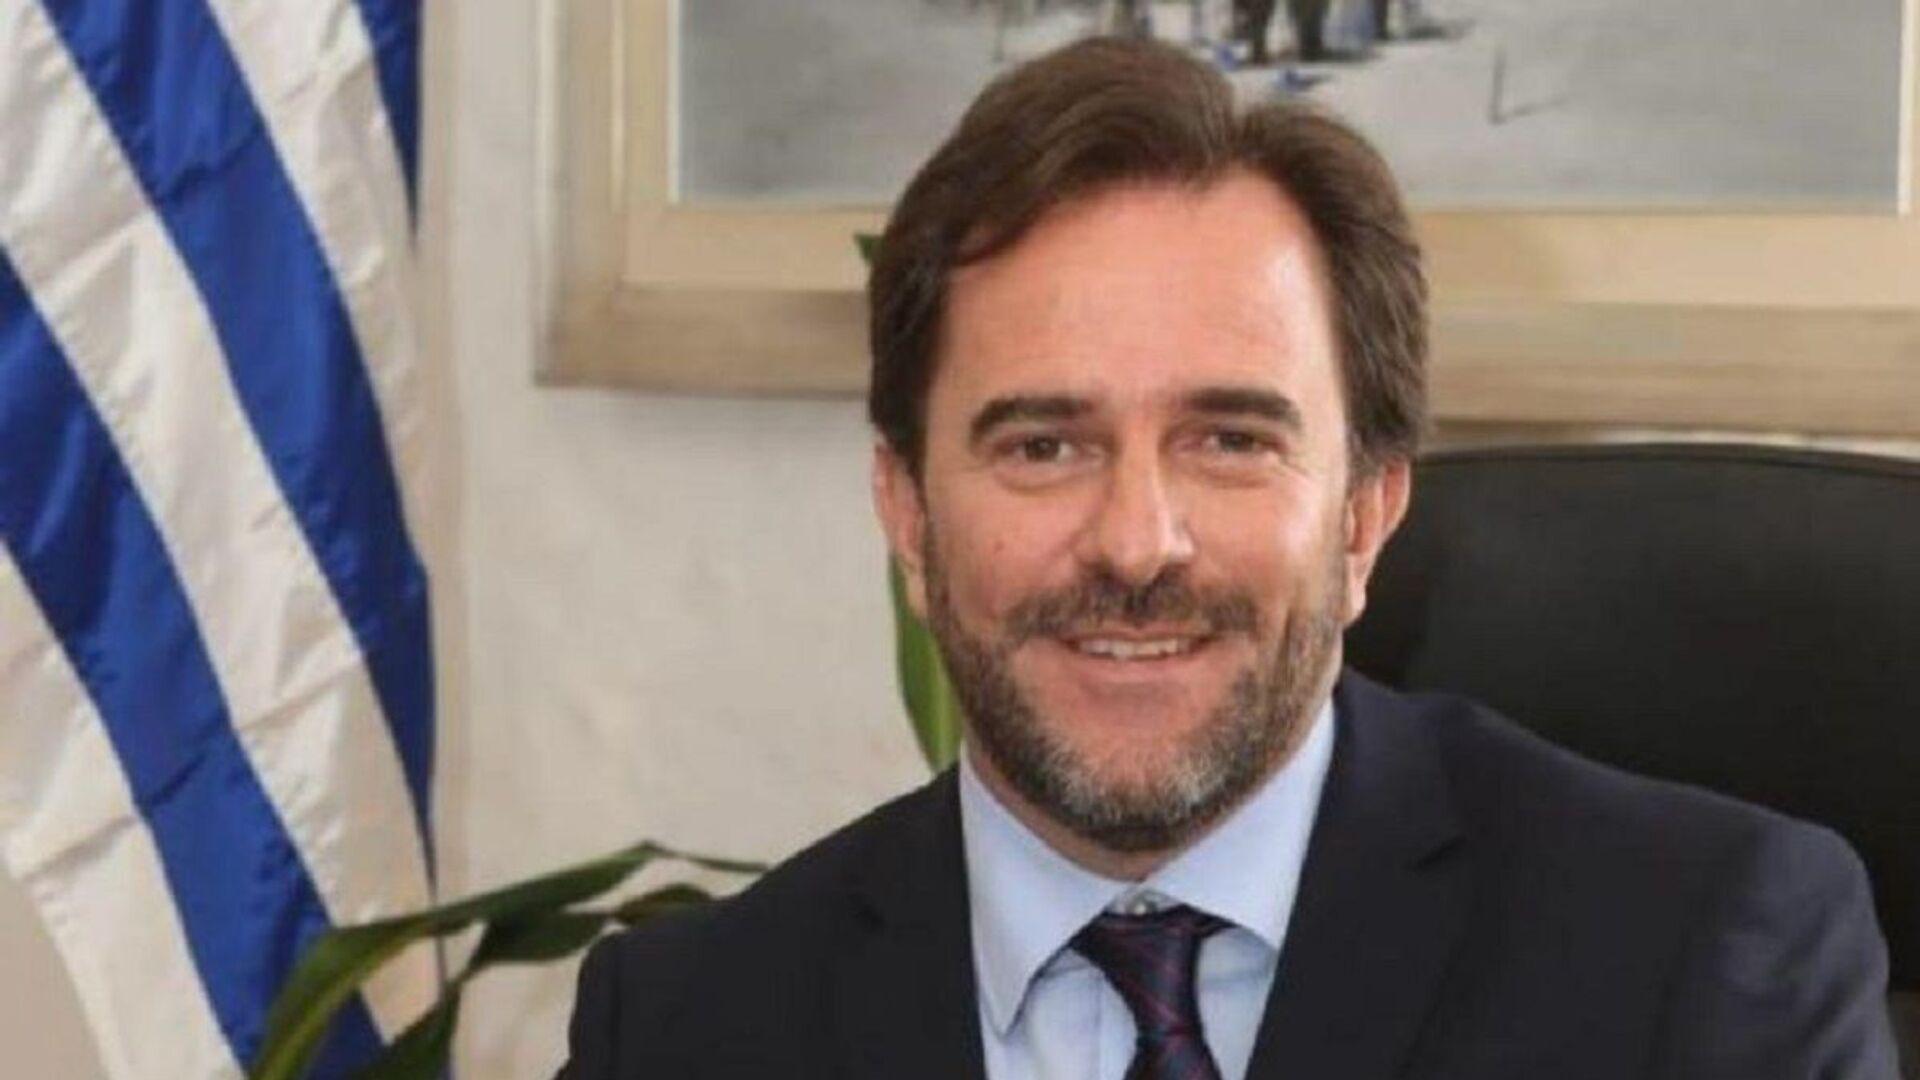 Germán Cardoso, ministro de Turismo de Uruguay - Sputnik Mundo, 1920, 11.08.2021